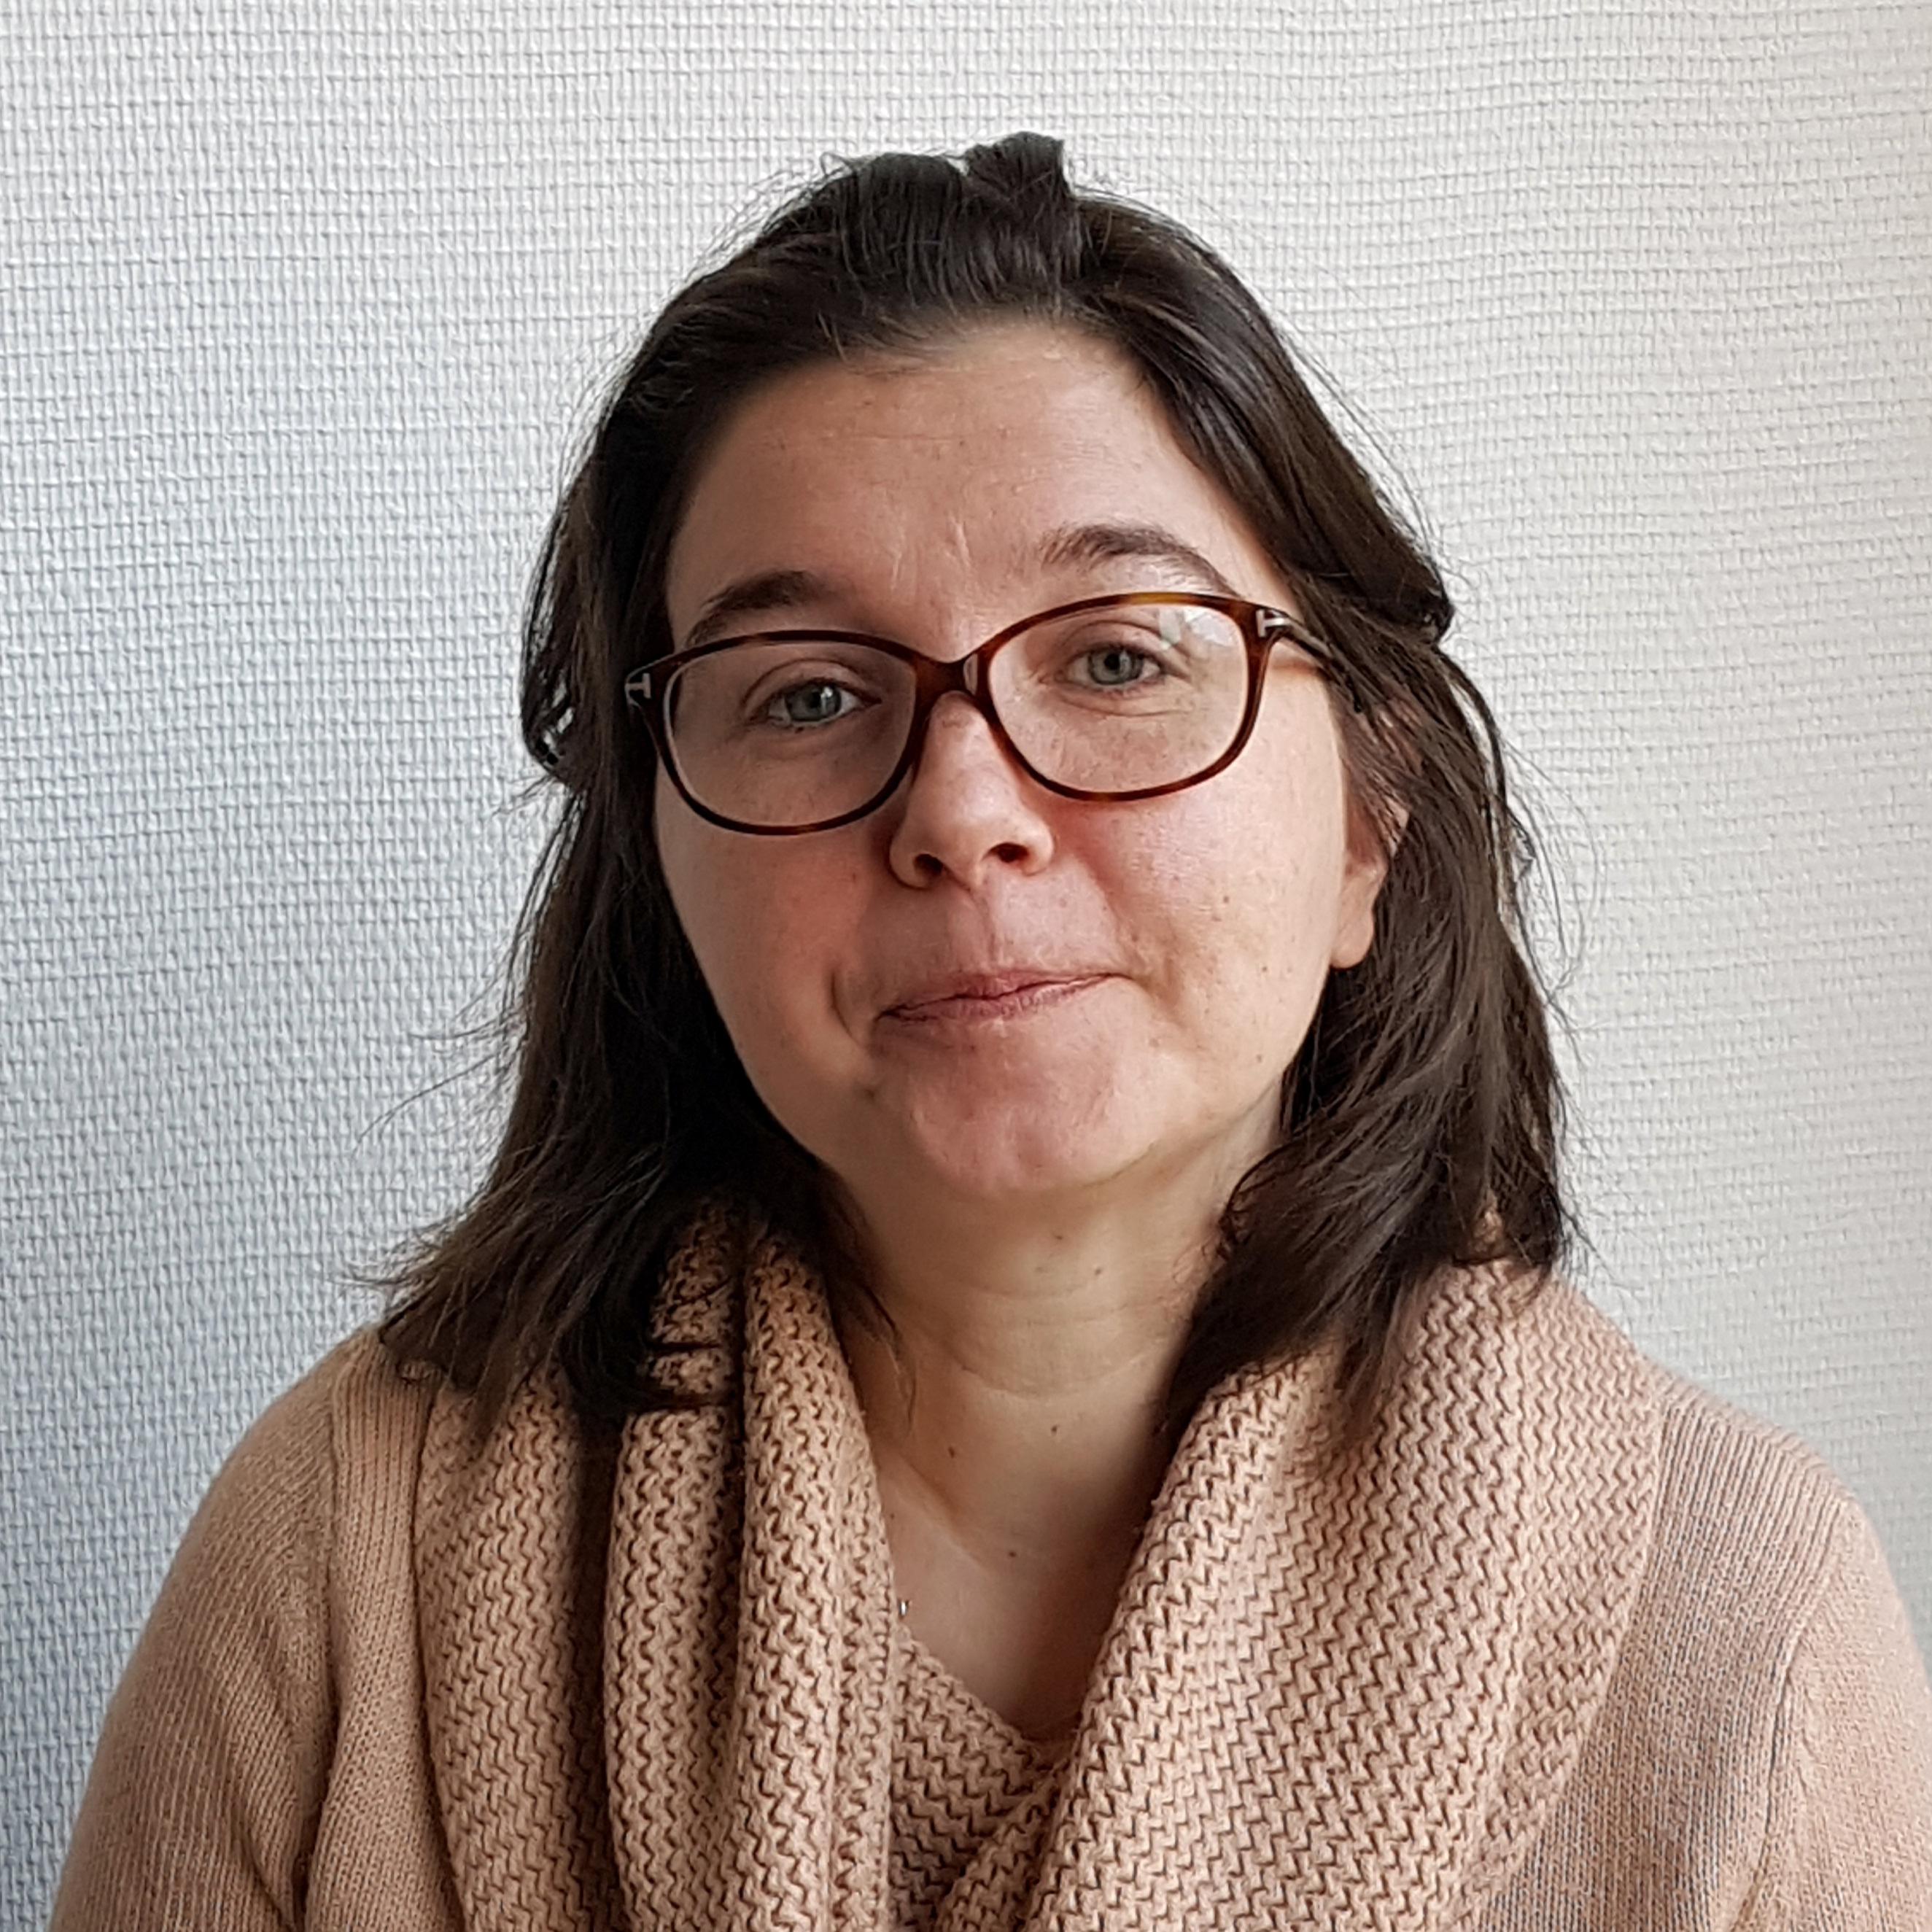 Marion Boinot